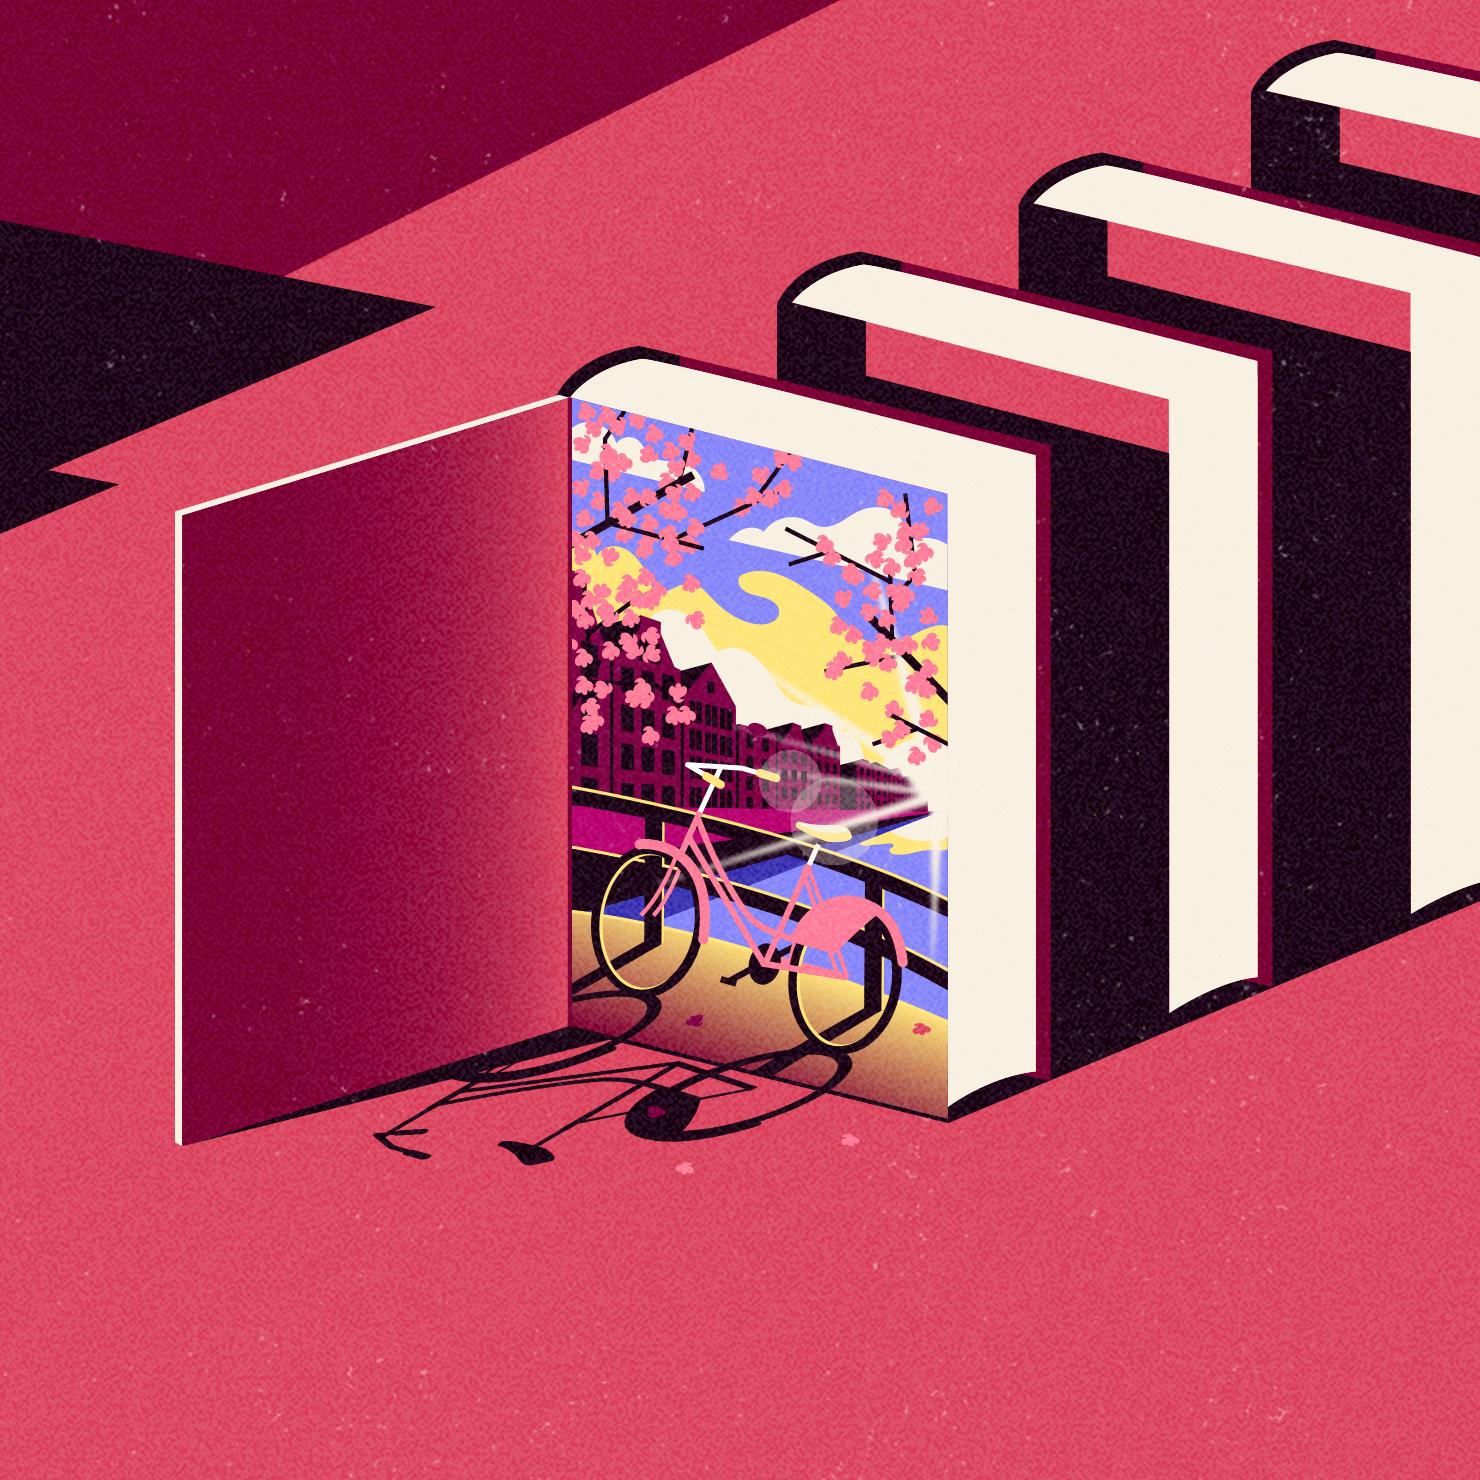 dale edwin murray freelance illustrator apple iBooks illustration